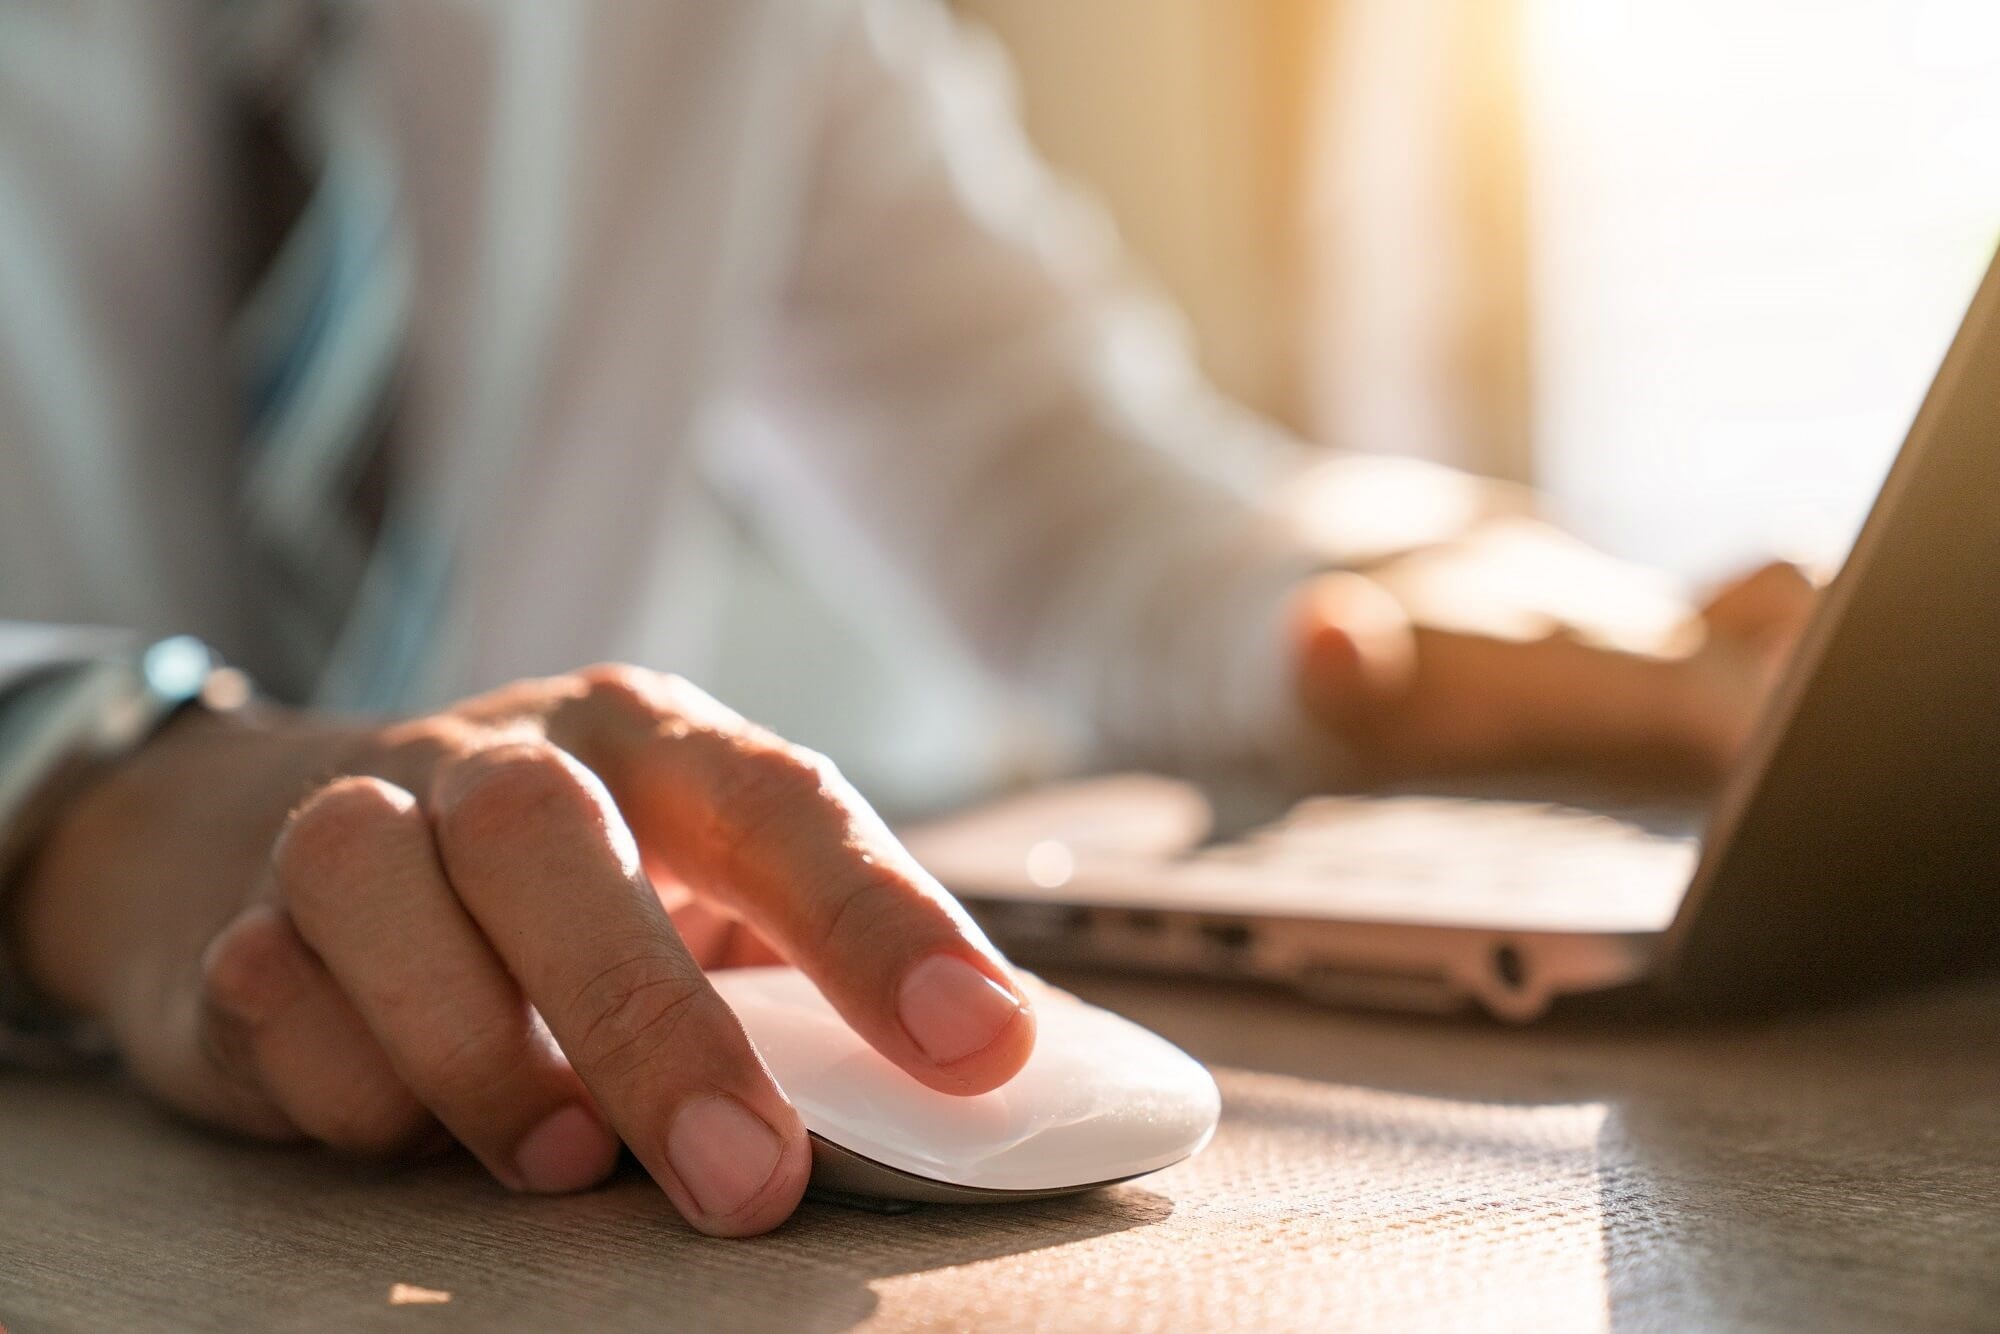 Most Insured Patients Not Using Online Portals